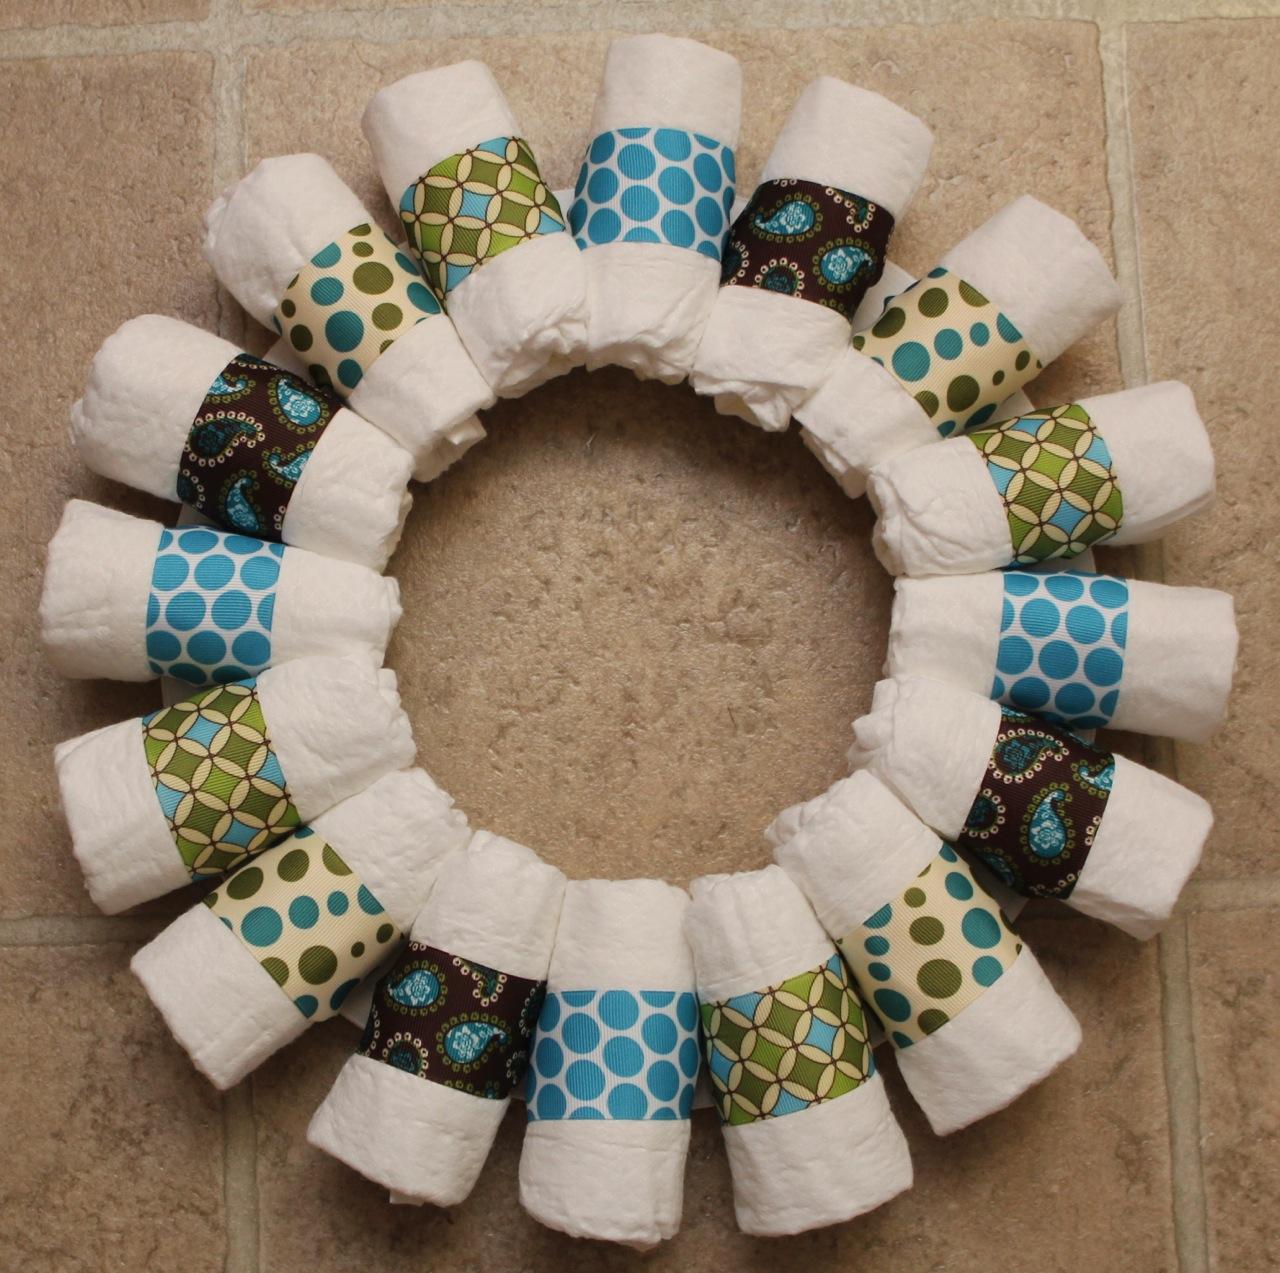 Baby Shower Wreath Instructions: Sew In Love: Diaper Wreath Tutorial